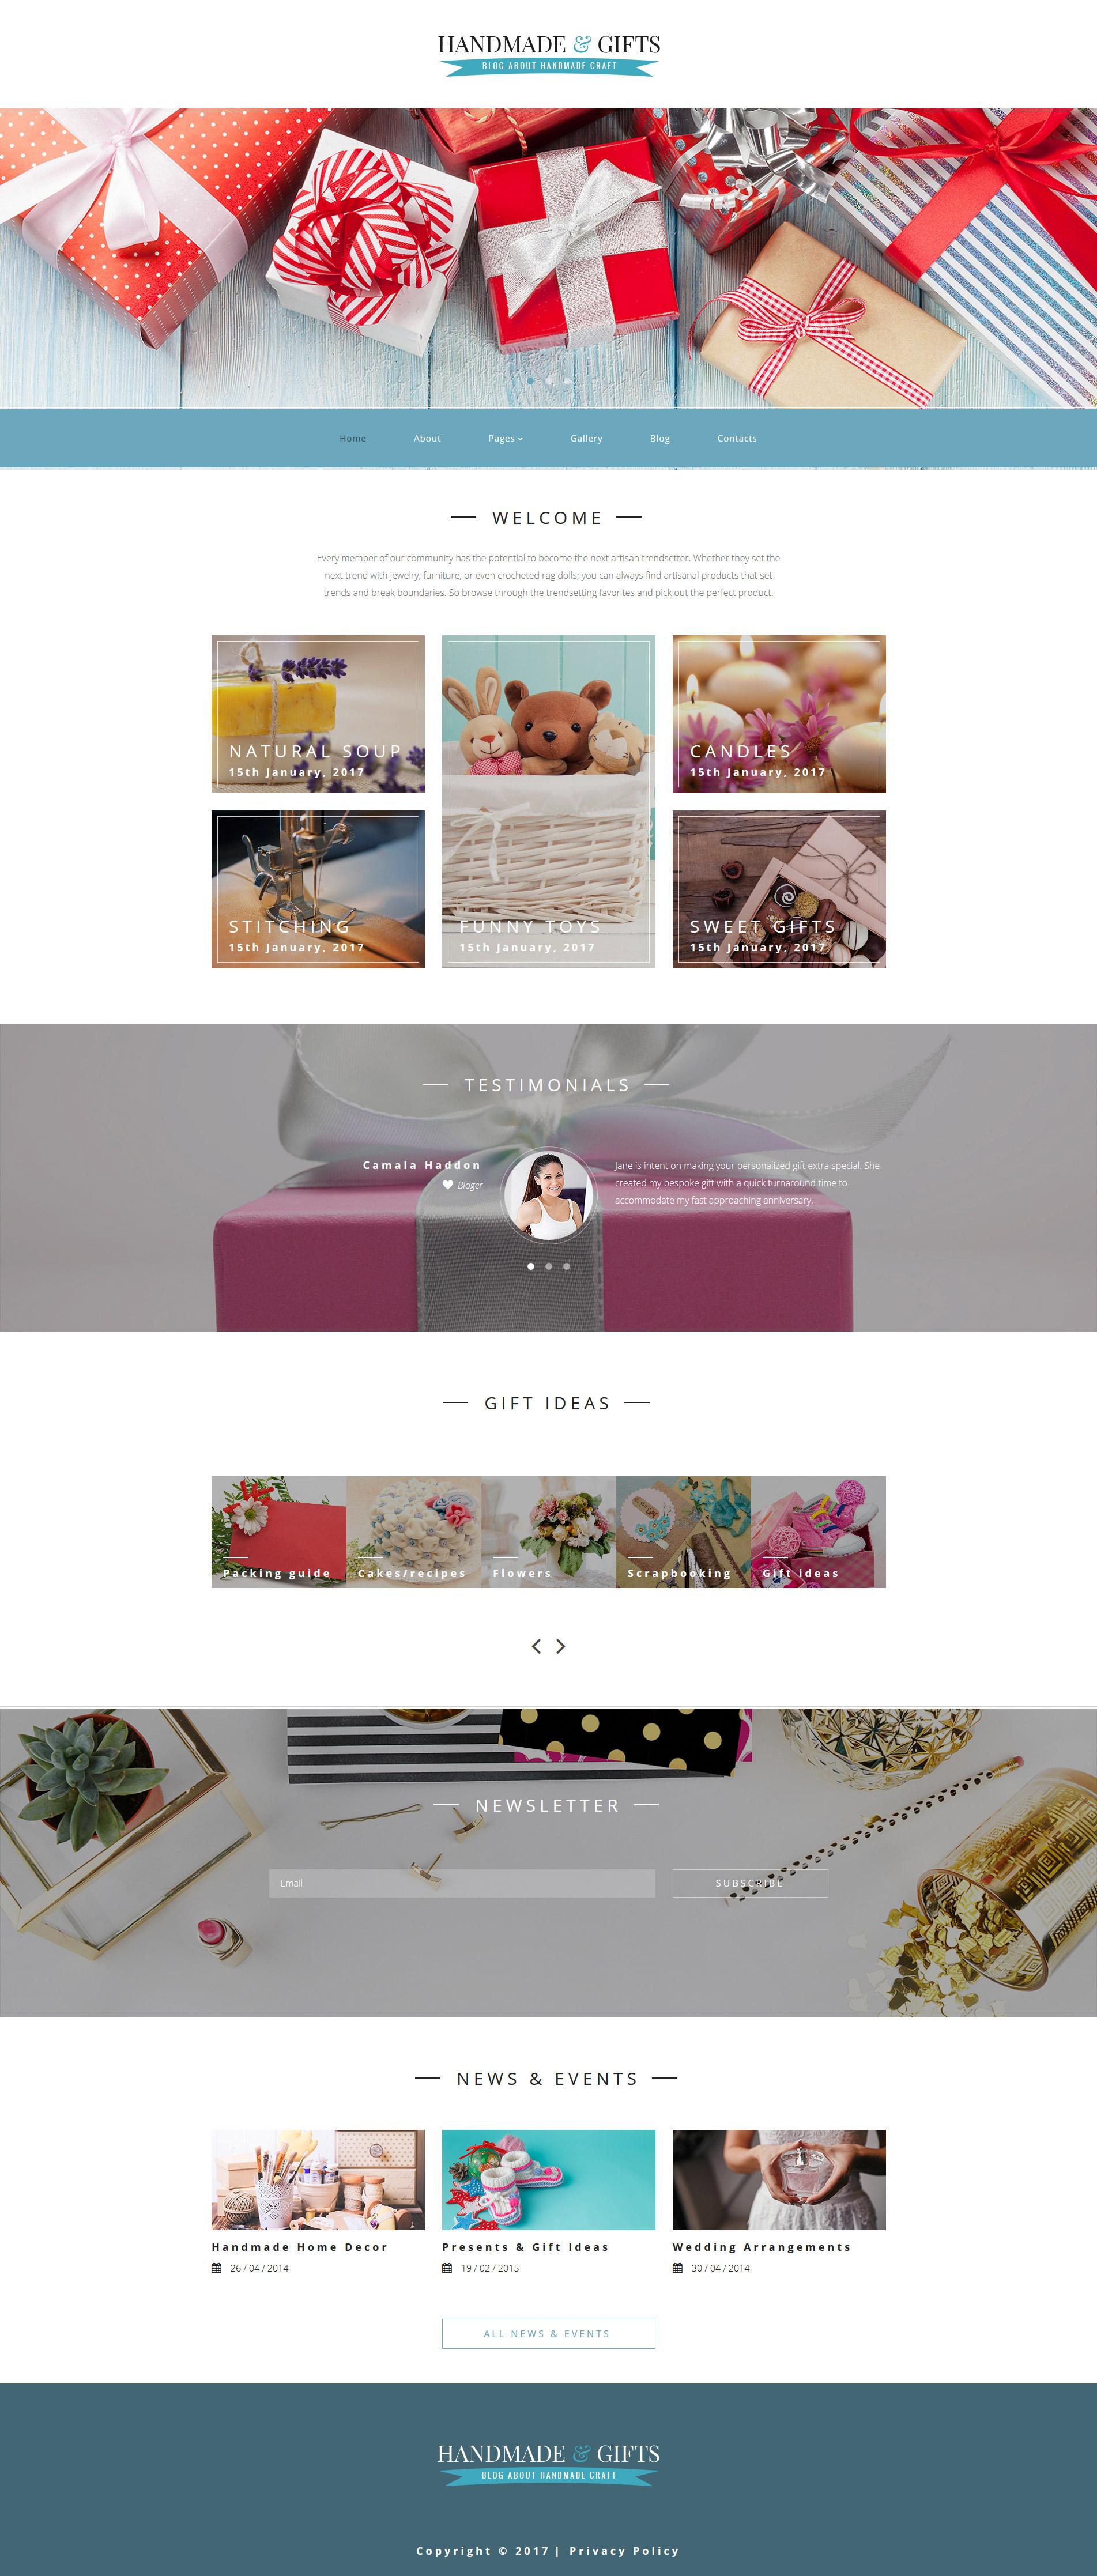 "Responzivní Joomla šablona ""Handmade & Gifts - Crafts Blog and Gift Store"" #62277 - screenshot"